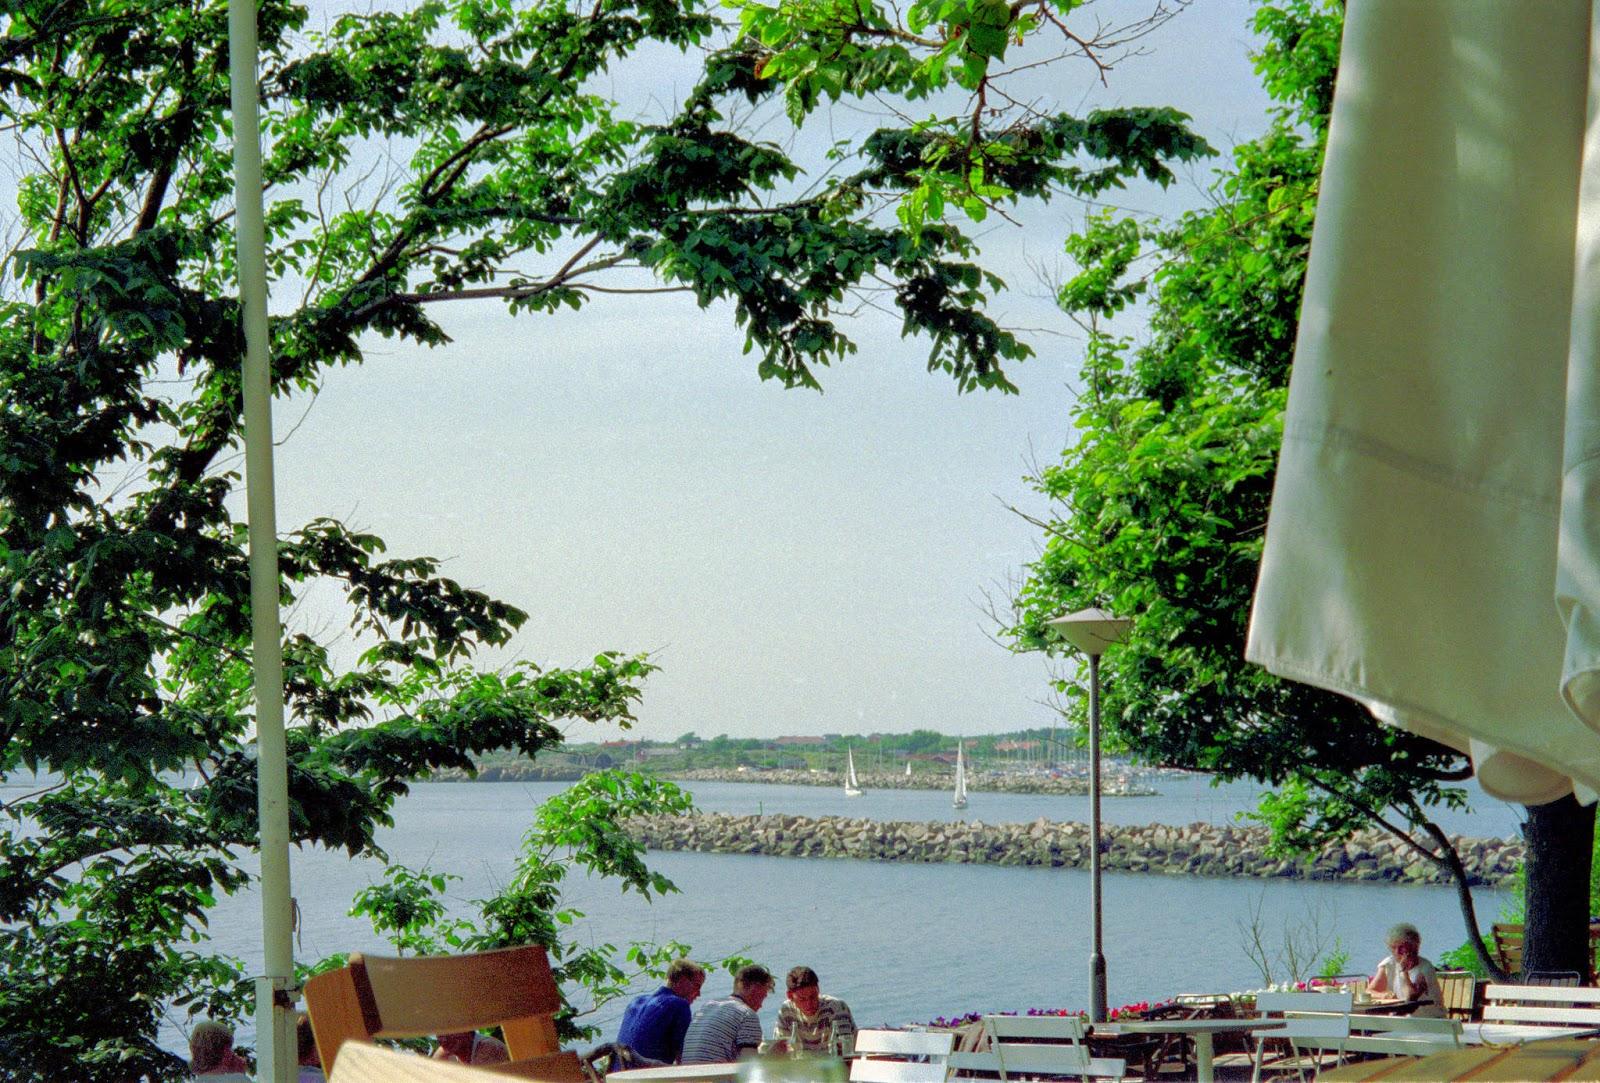 At Helsingborg